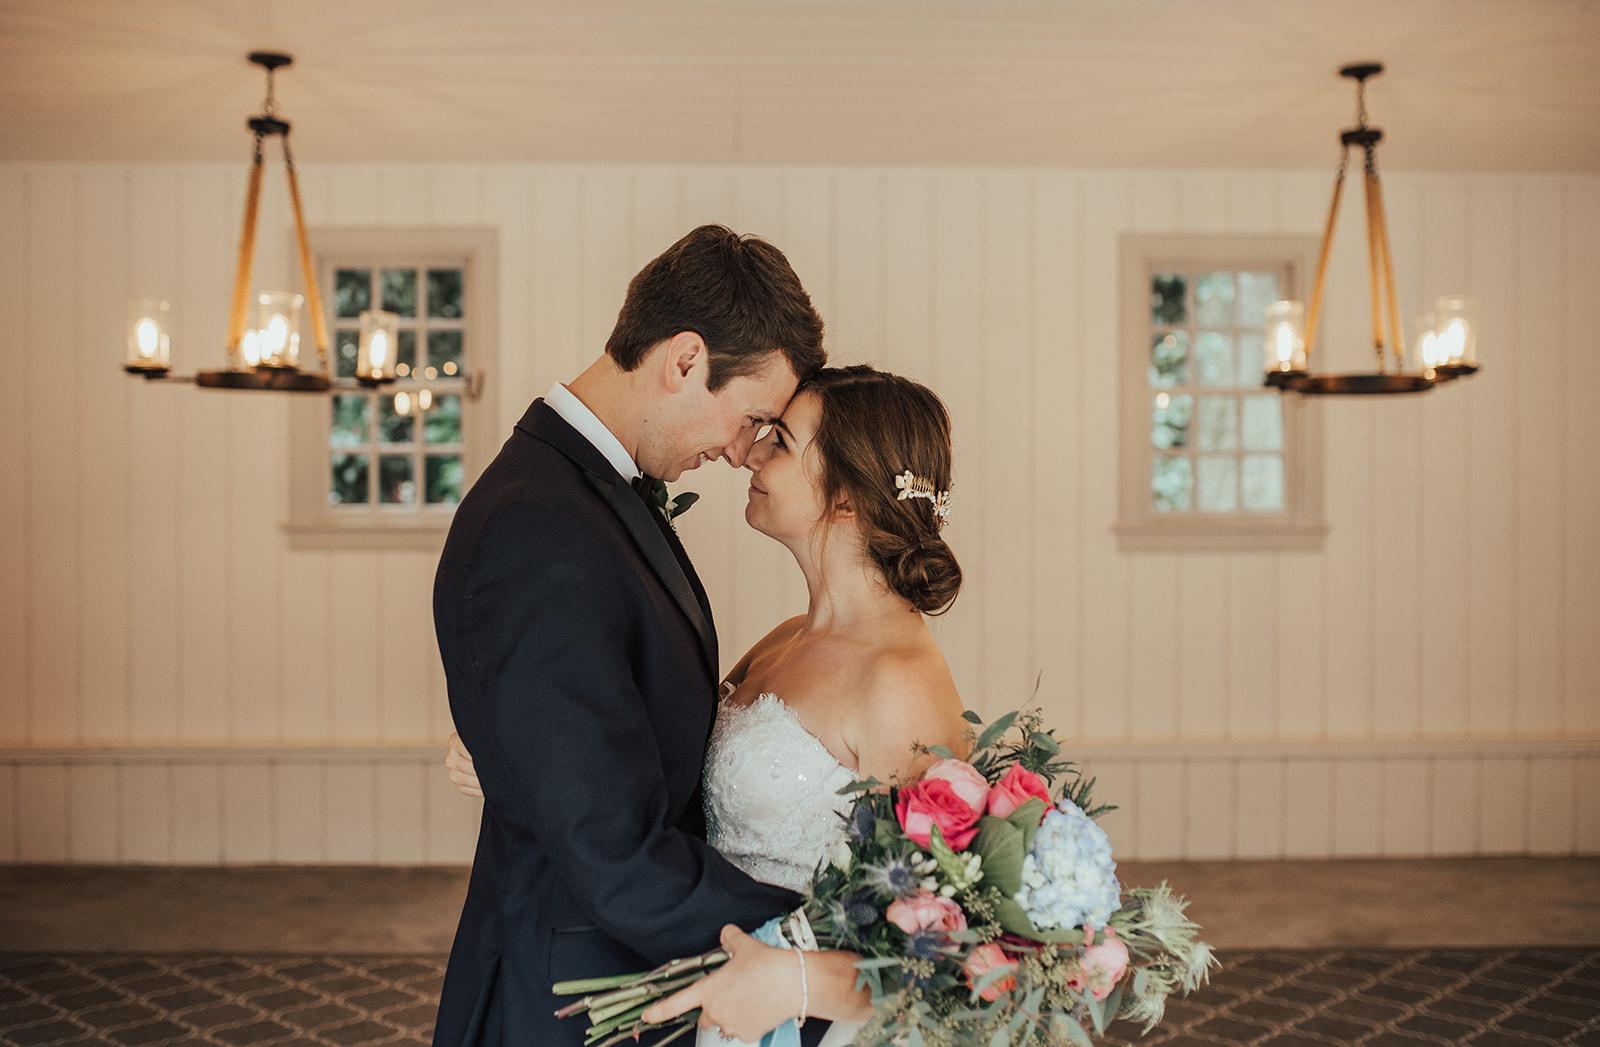 Richmond Wedding By SB Photographs219219219219.jpg